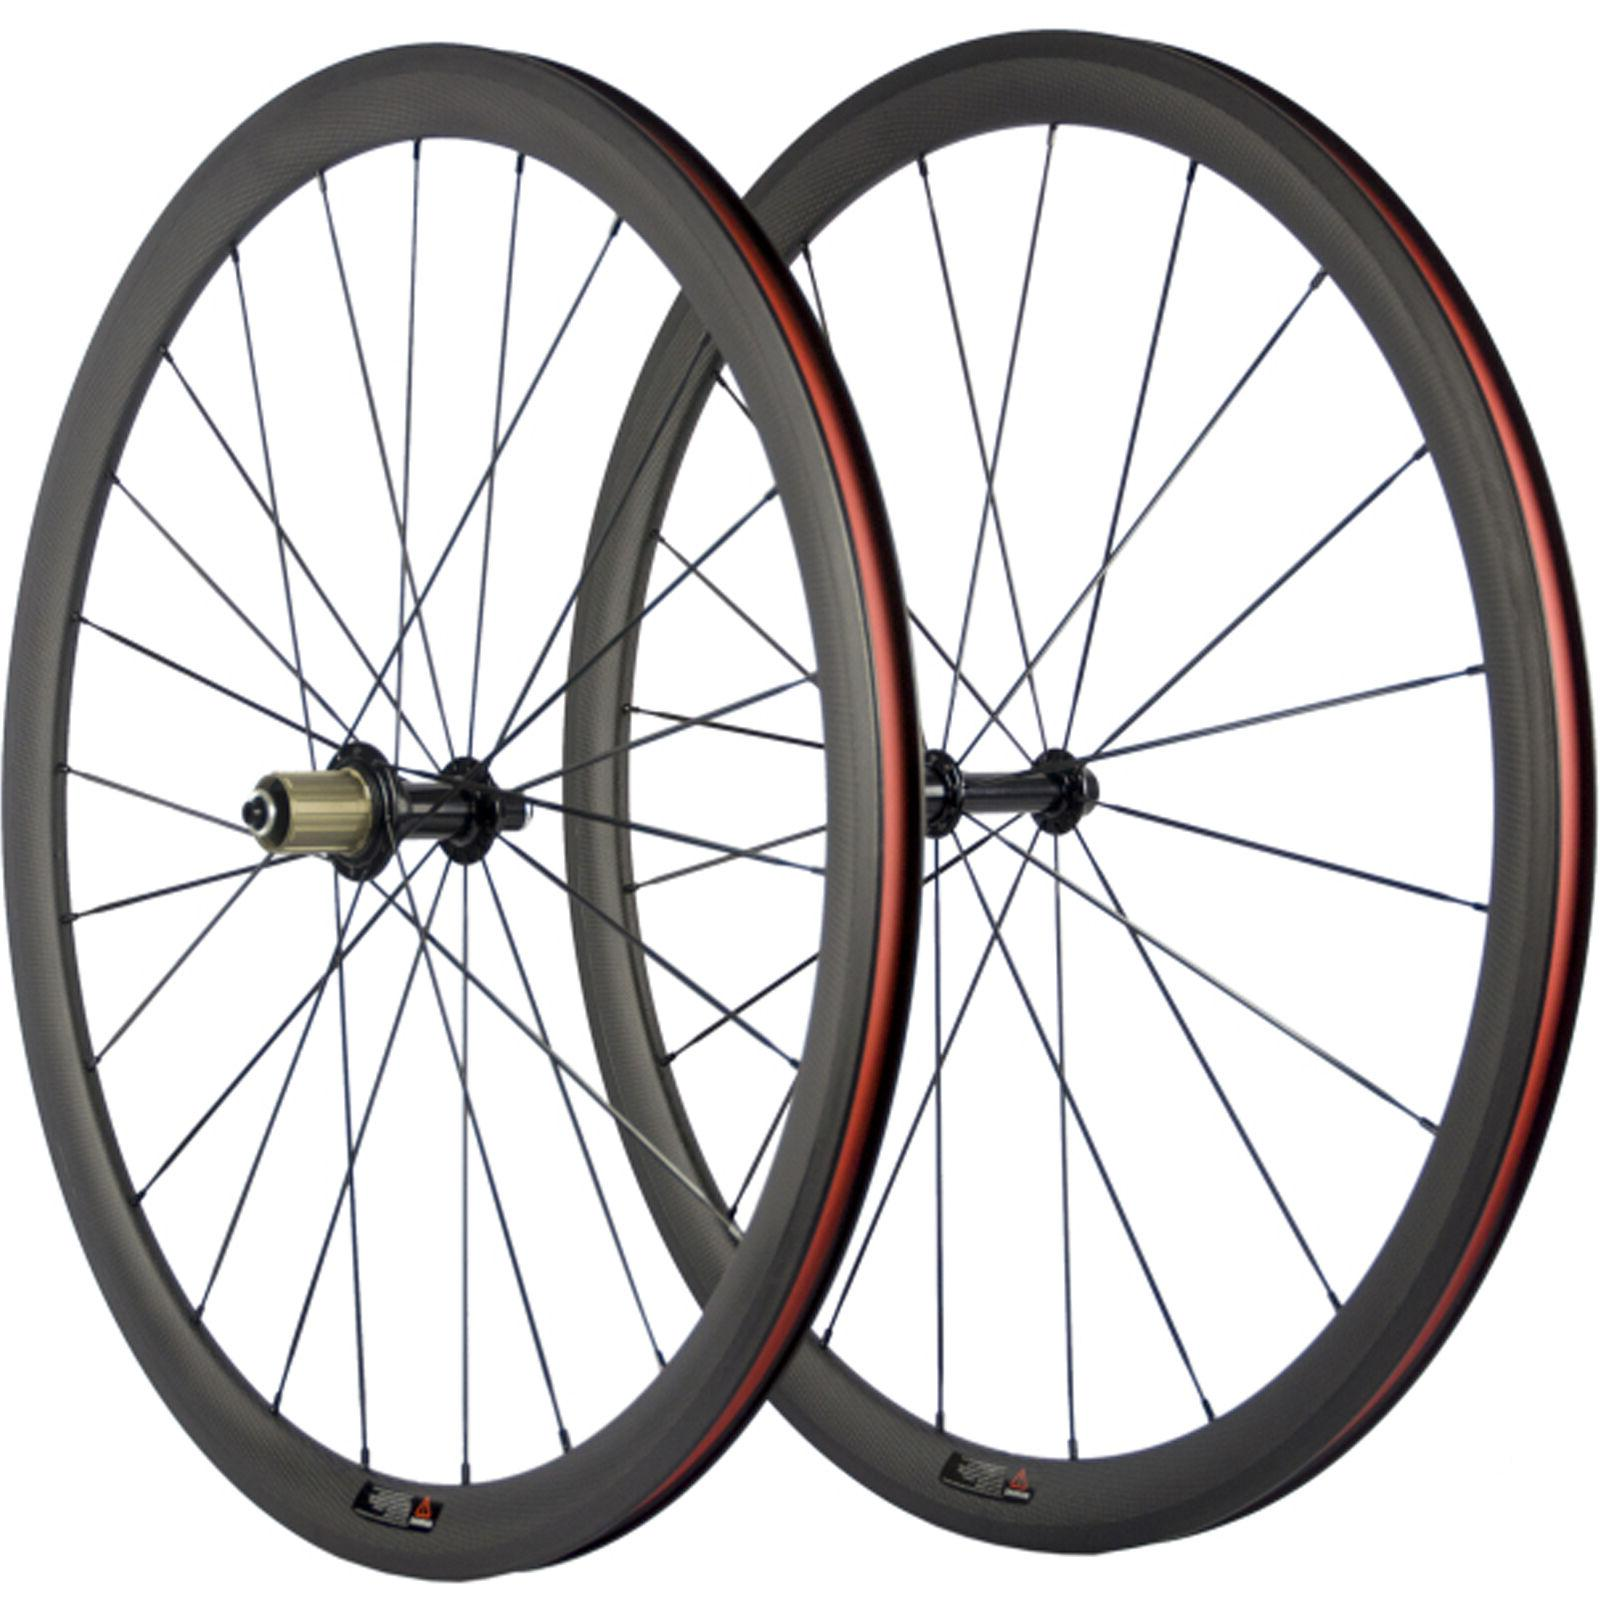 basalt brake surface 38mm clincher carbon wheelset